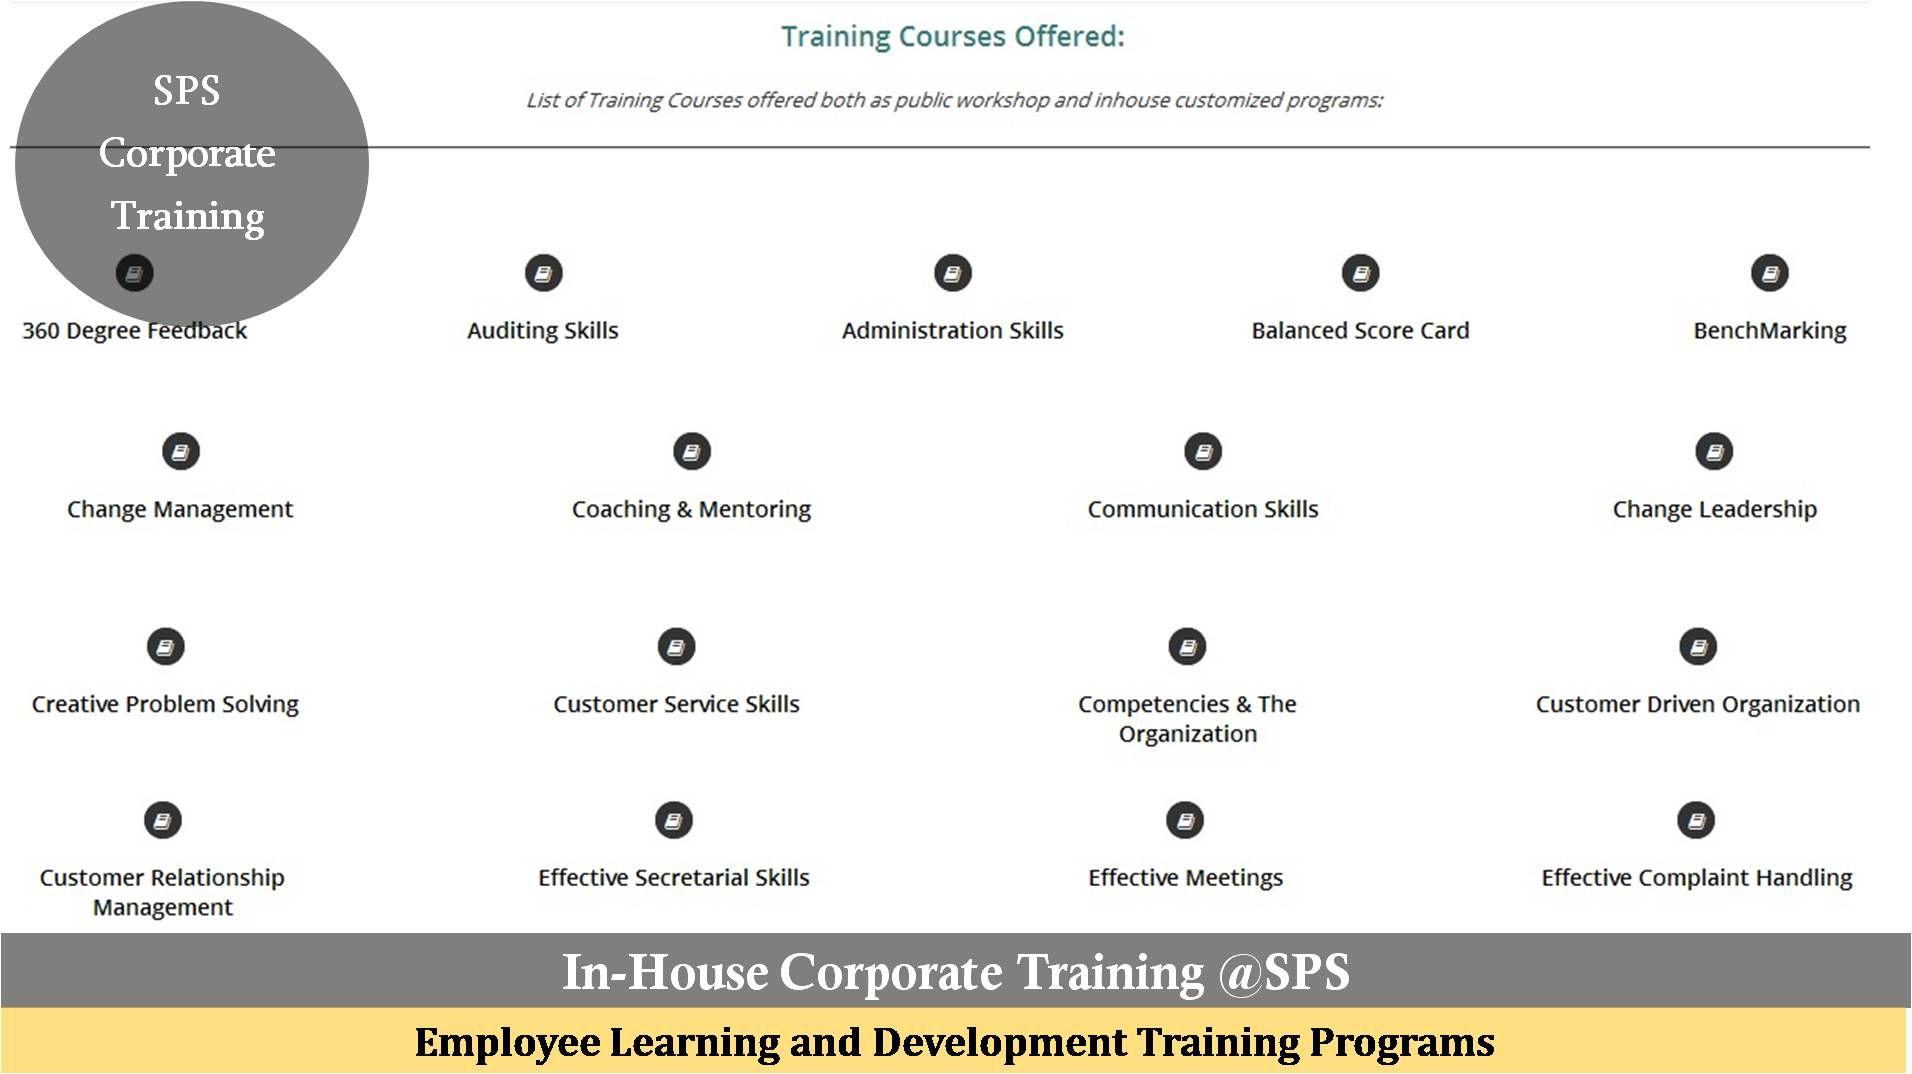 Certification Training Programs For Corporate Professionals In Dubai